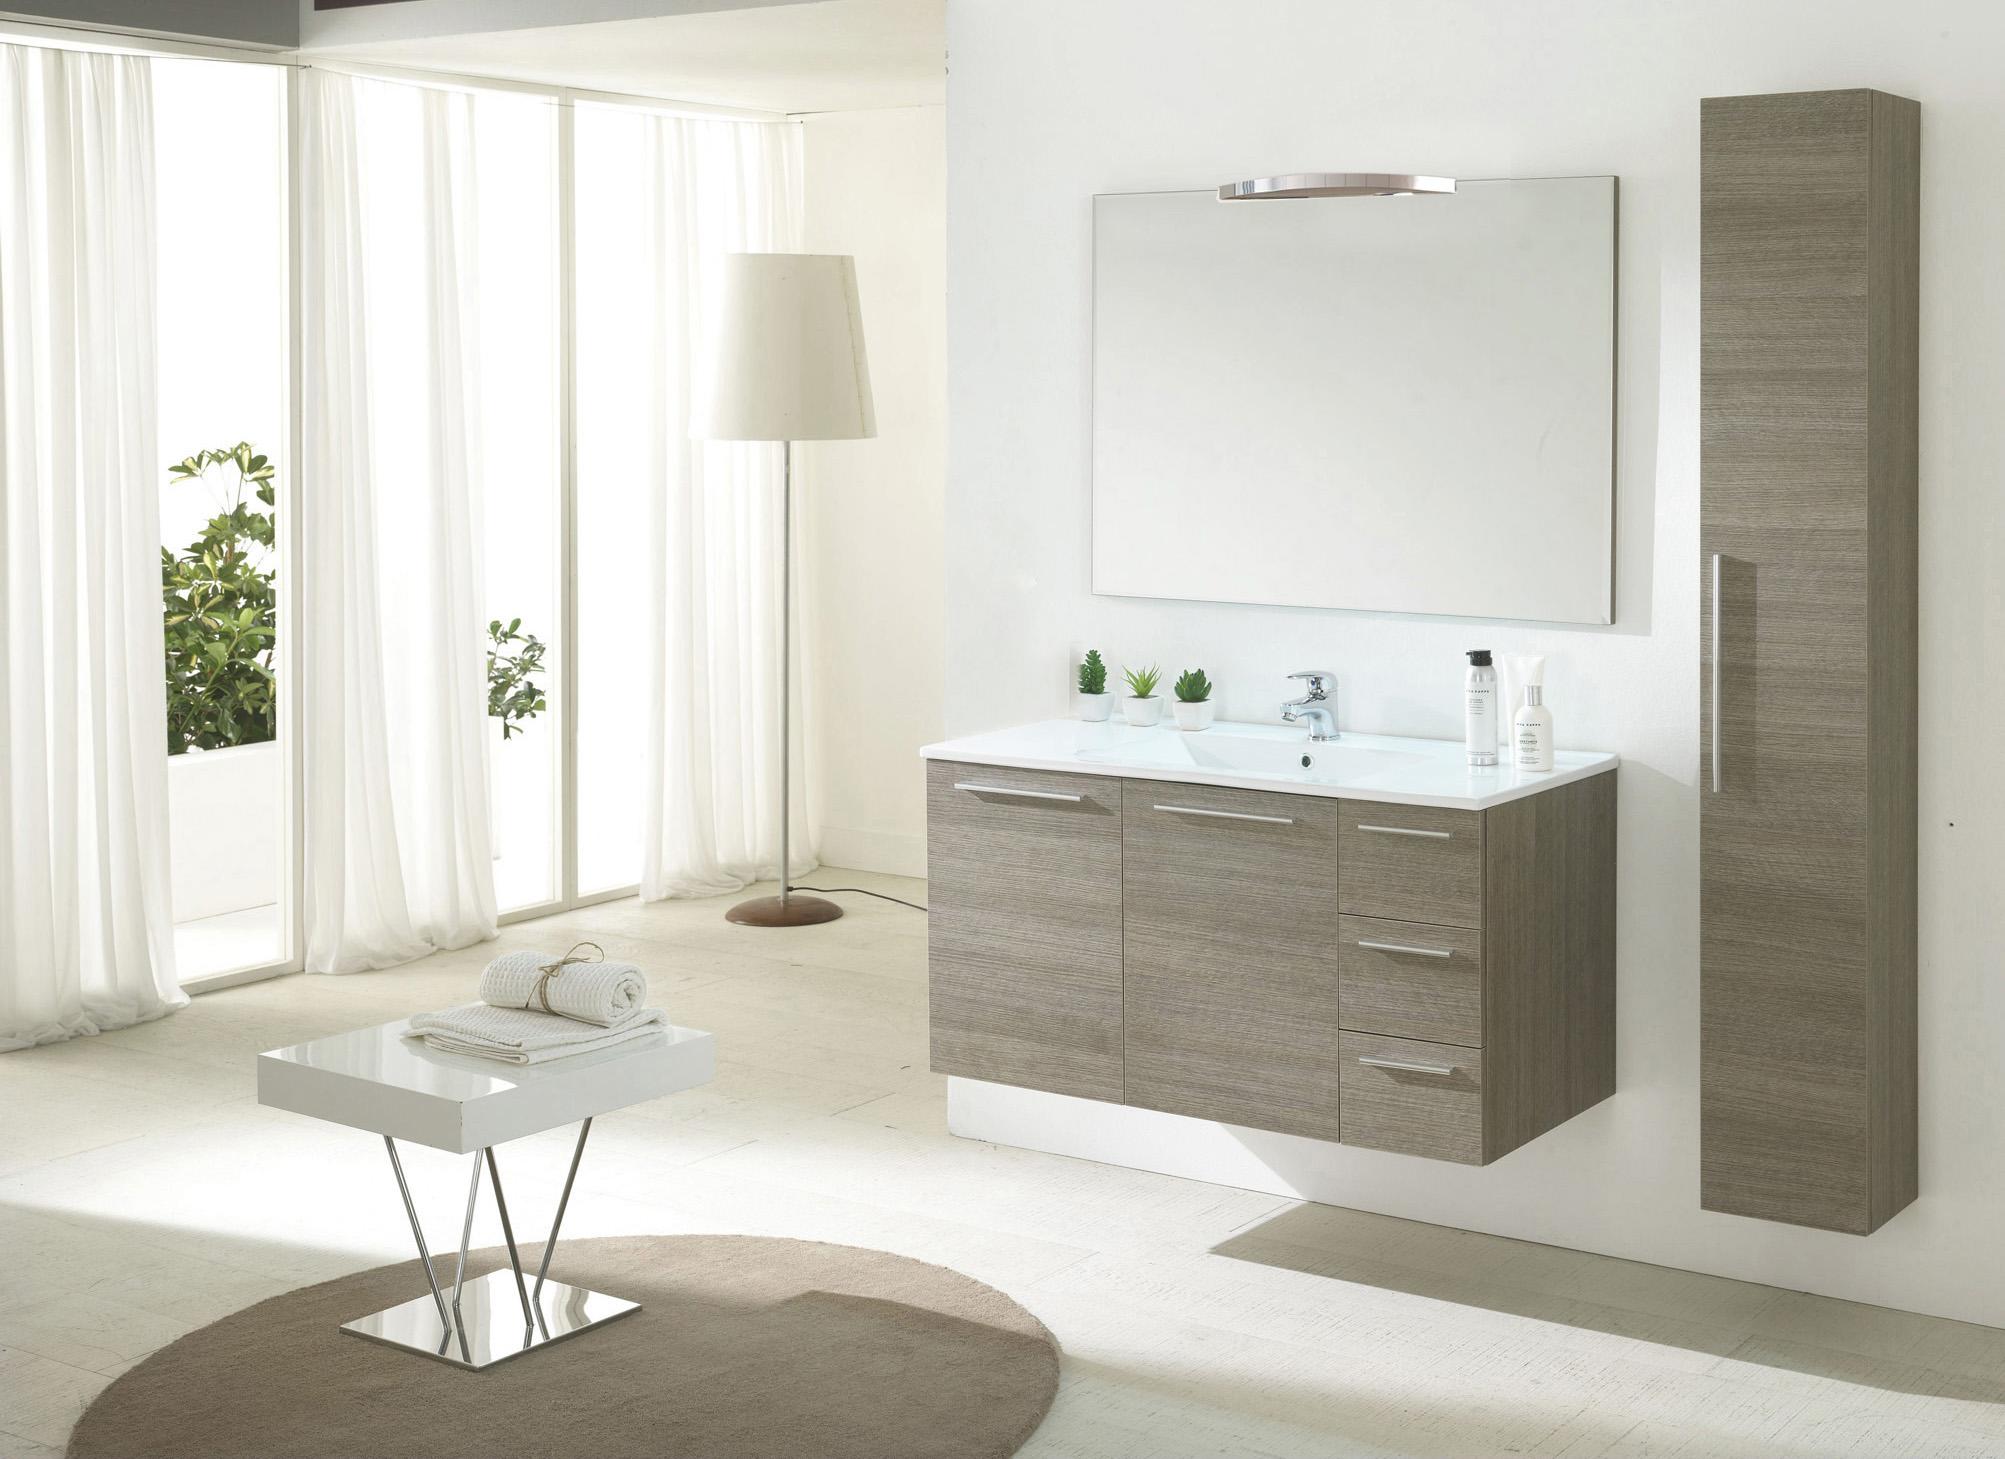 Arredo bagno ideal standard : catalogo arredo bagno ideal standard ...